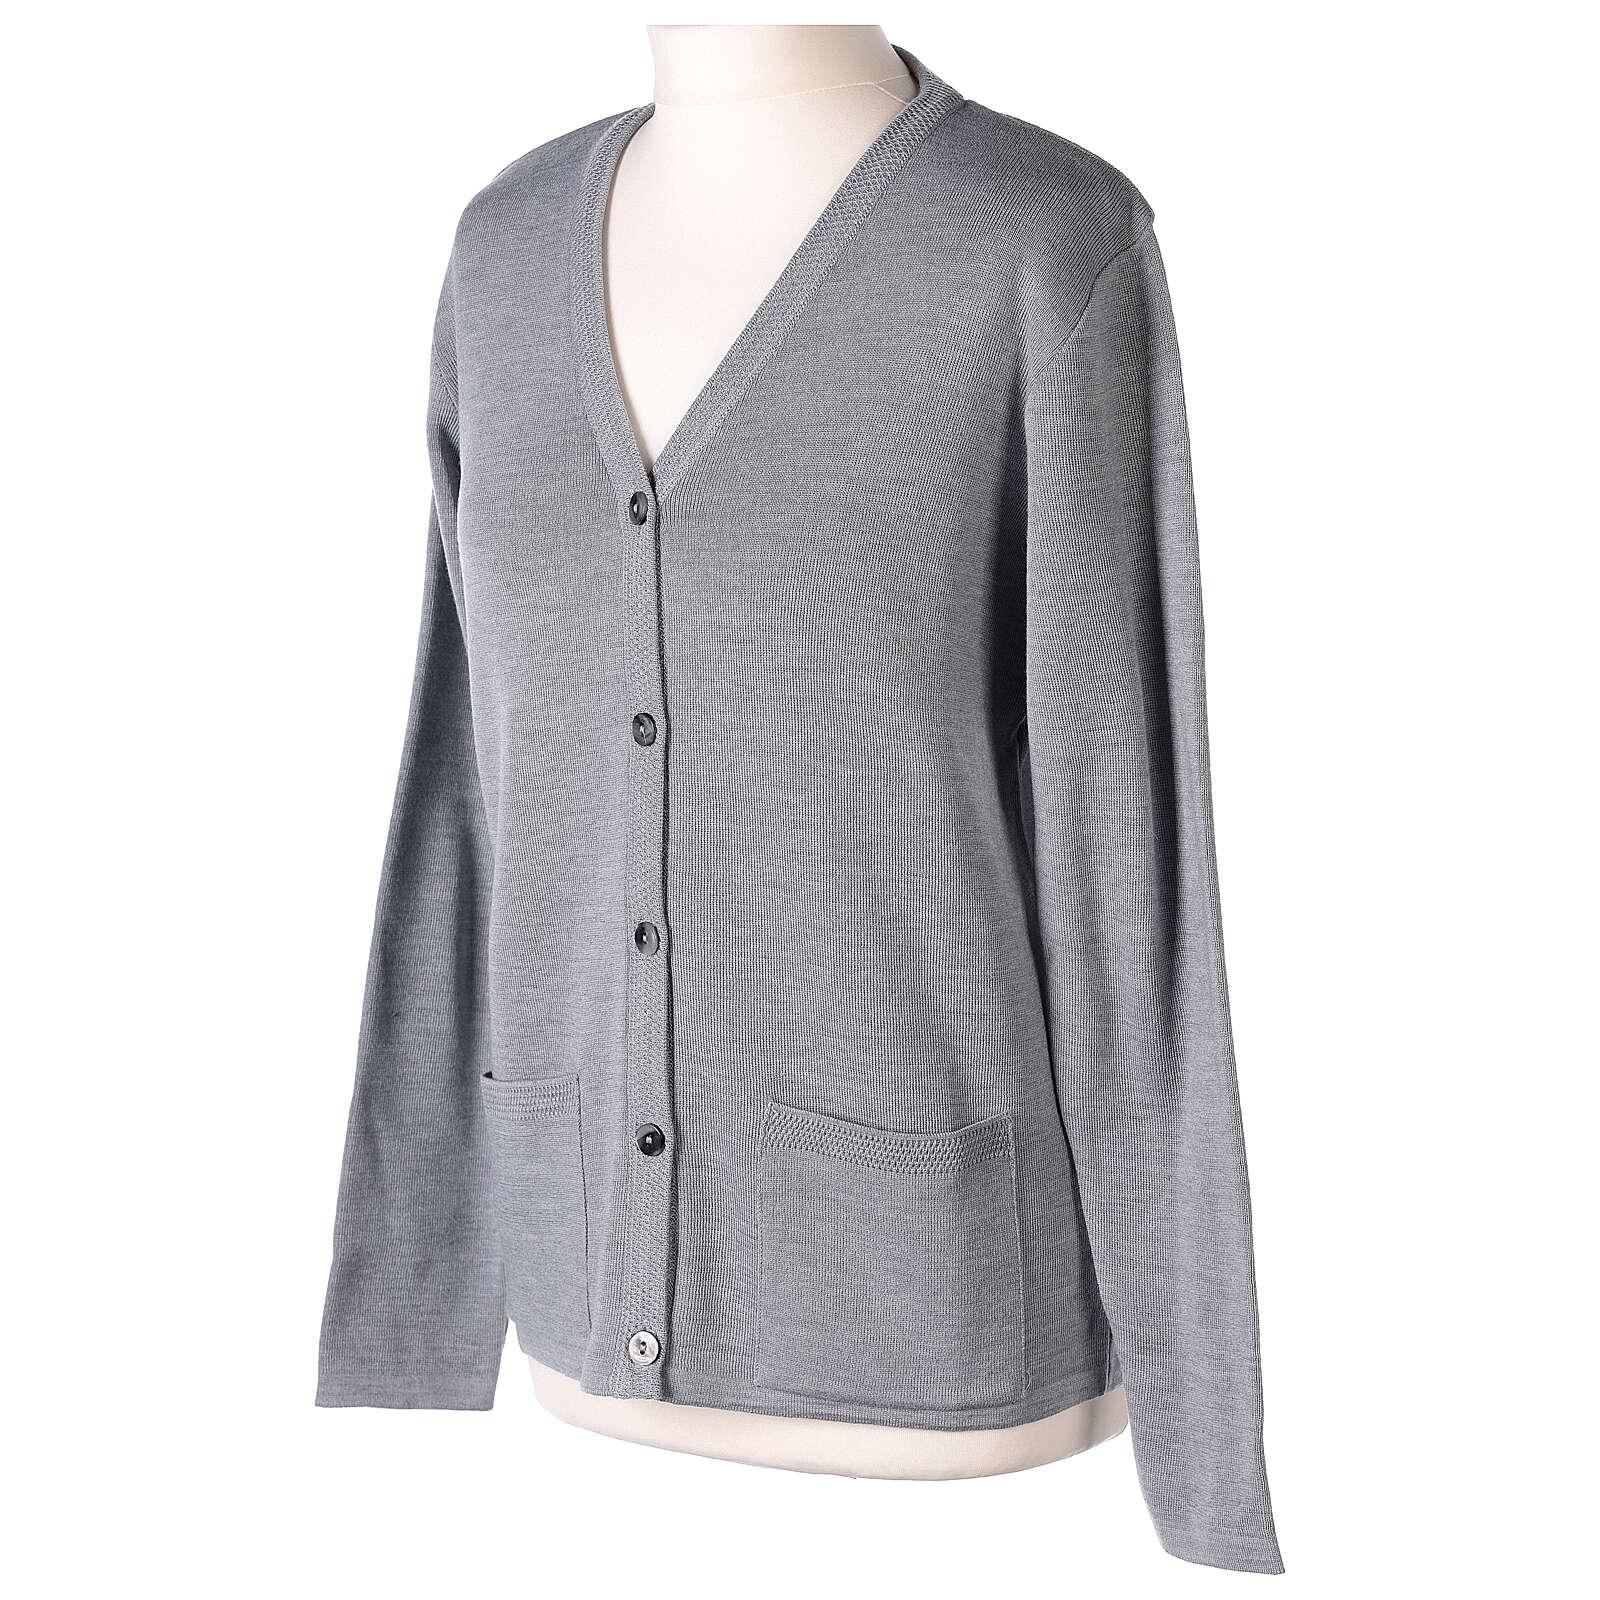 Nun grey V-neck cardigan with pockets PLUS SIZES 50% merino wool 50% acrylic In Primis 4